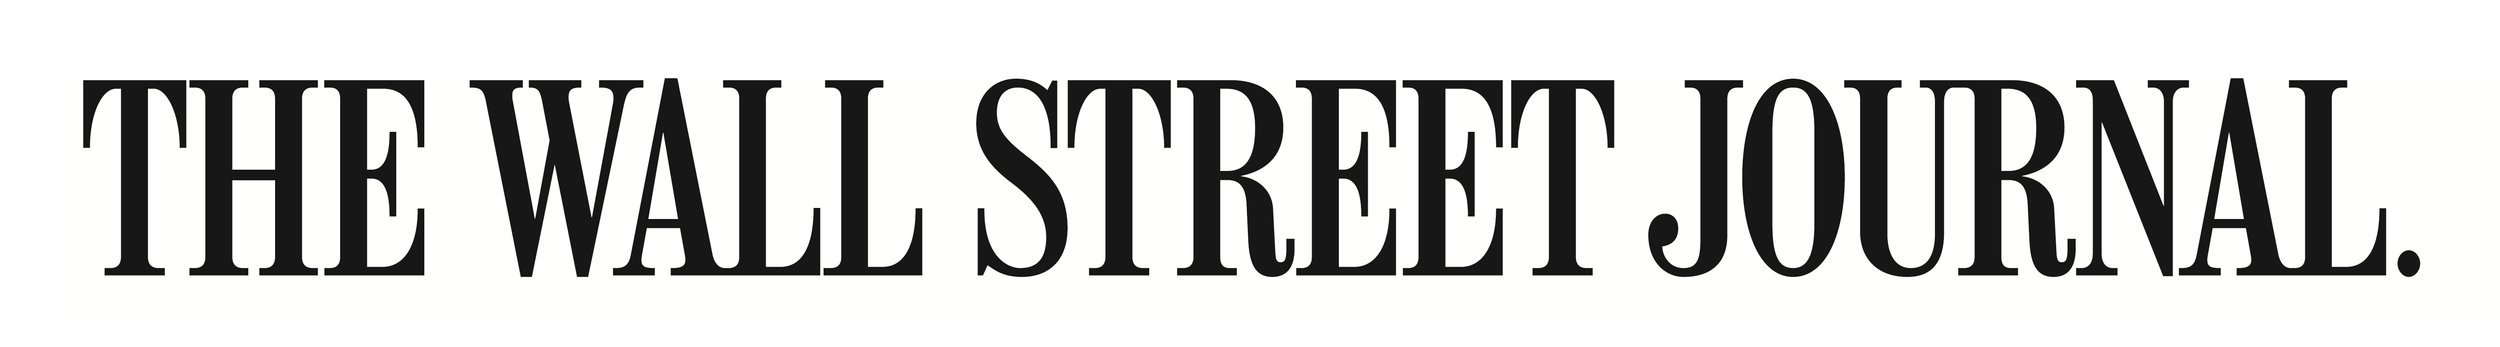 wall-street-journal-logo-white-png-the-wall-street-journal.jpg